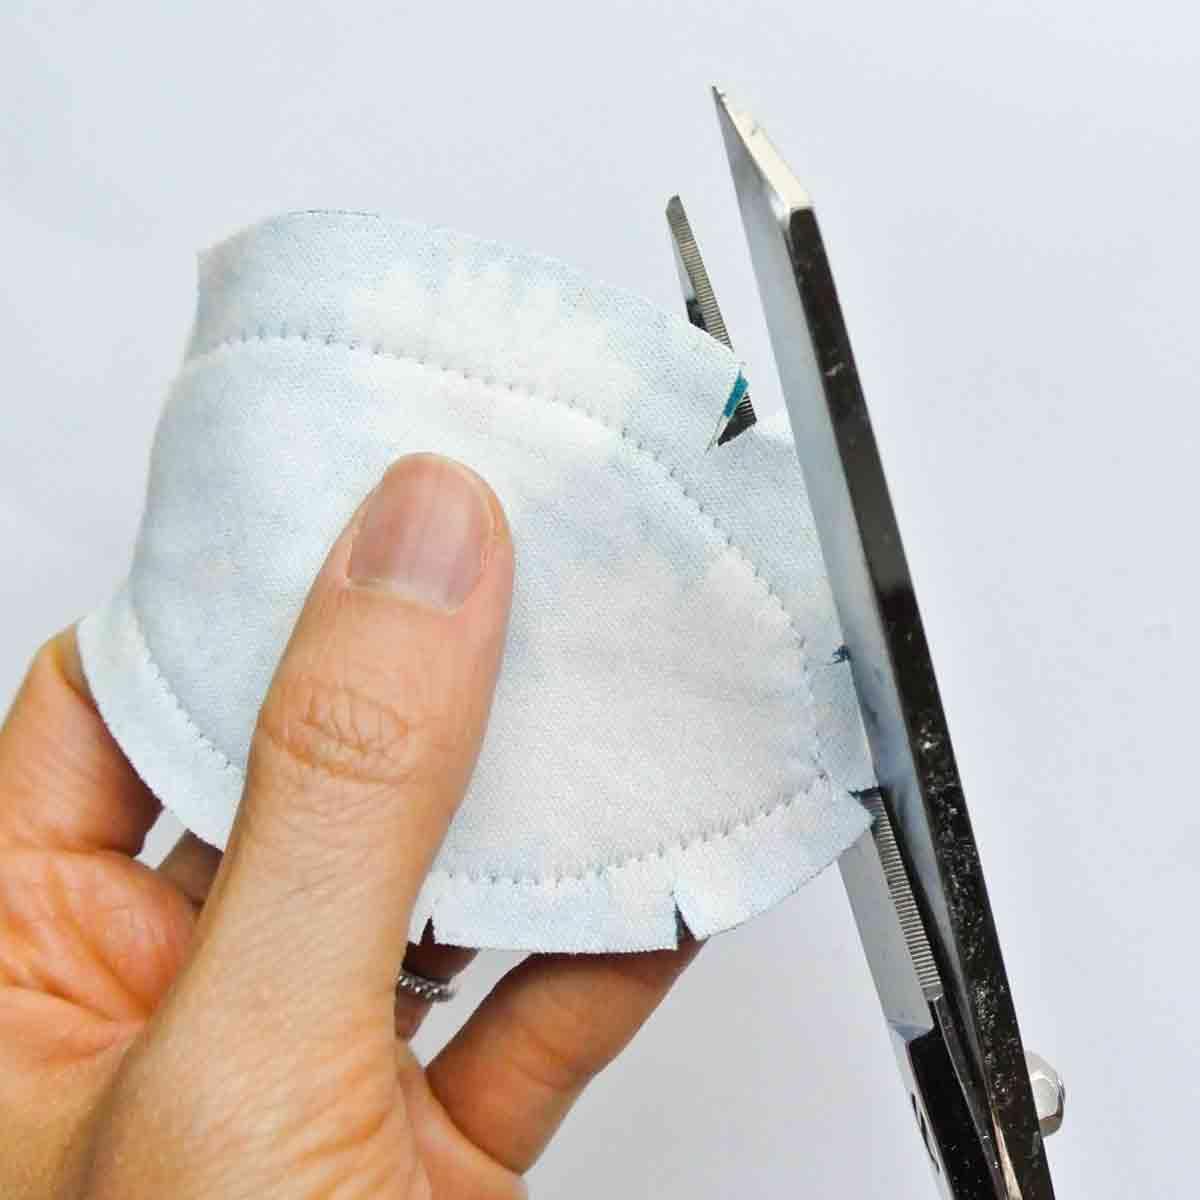 Triming seam allowance of bow tie for DIY headband